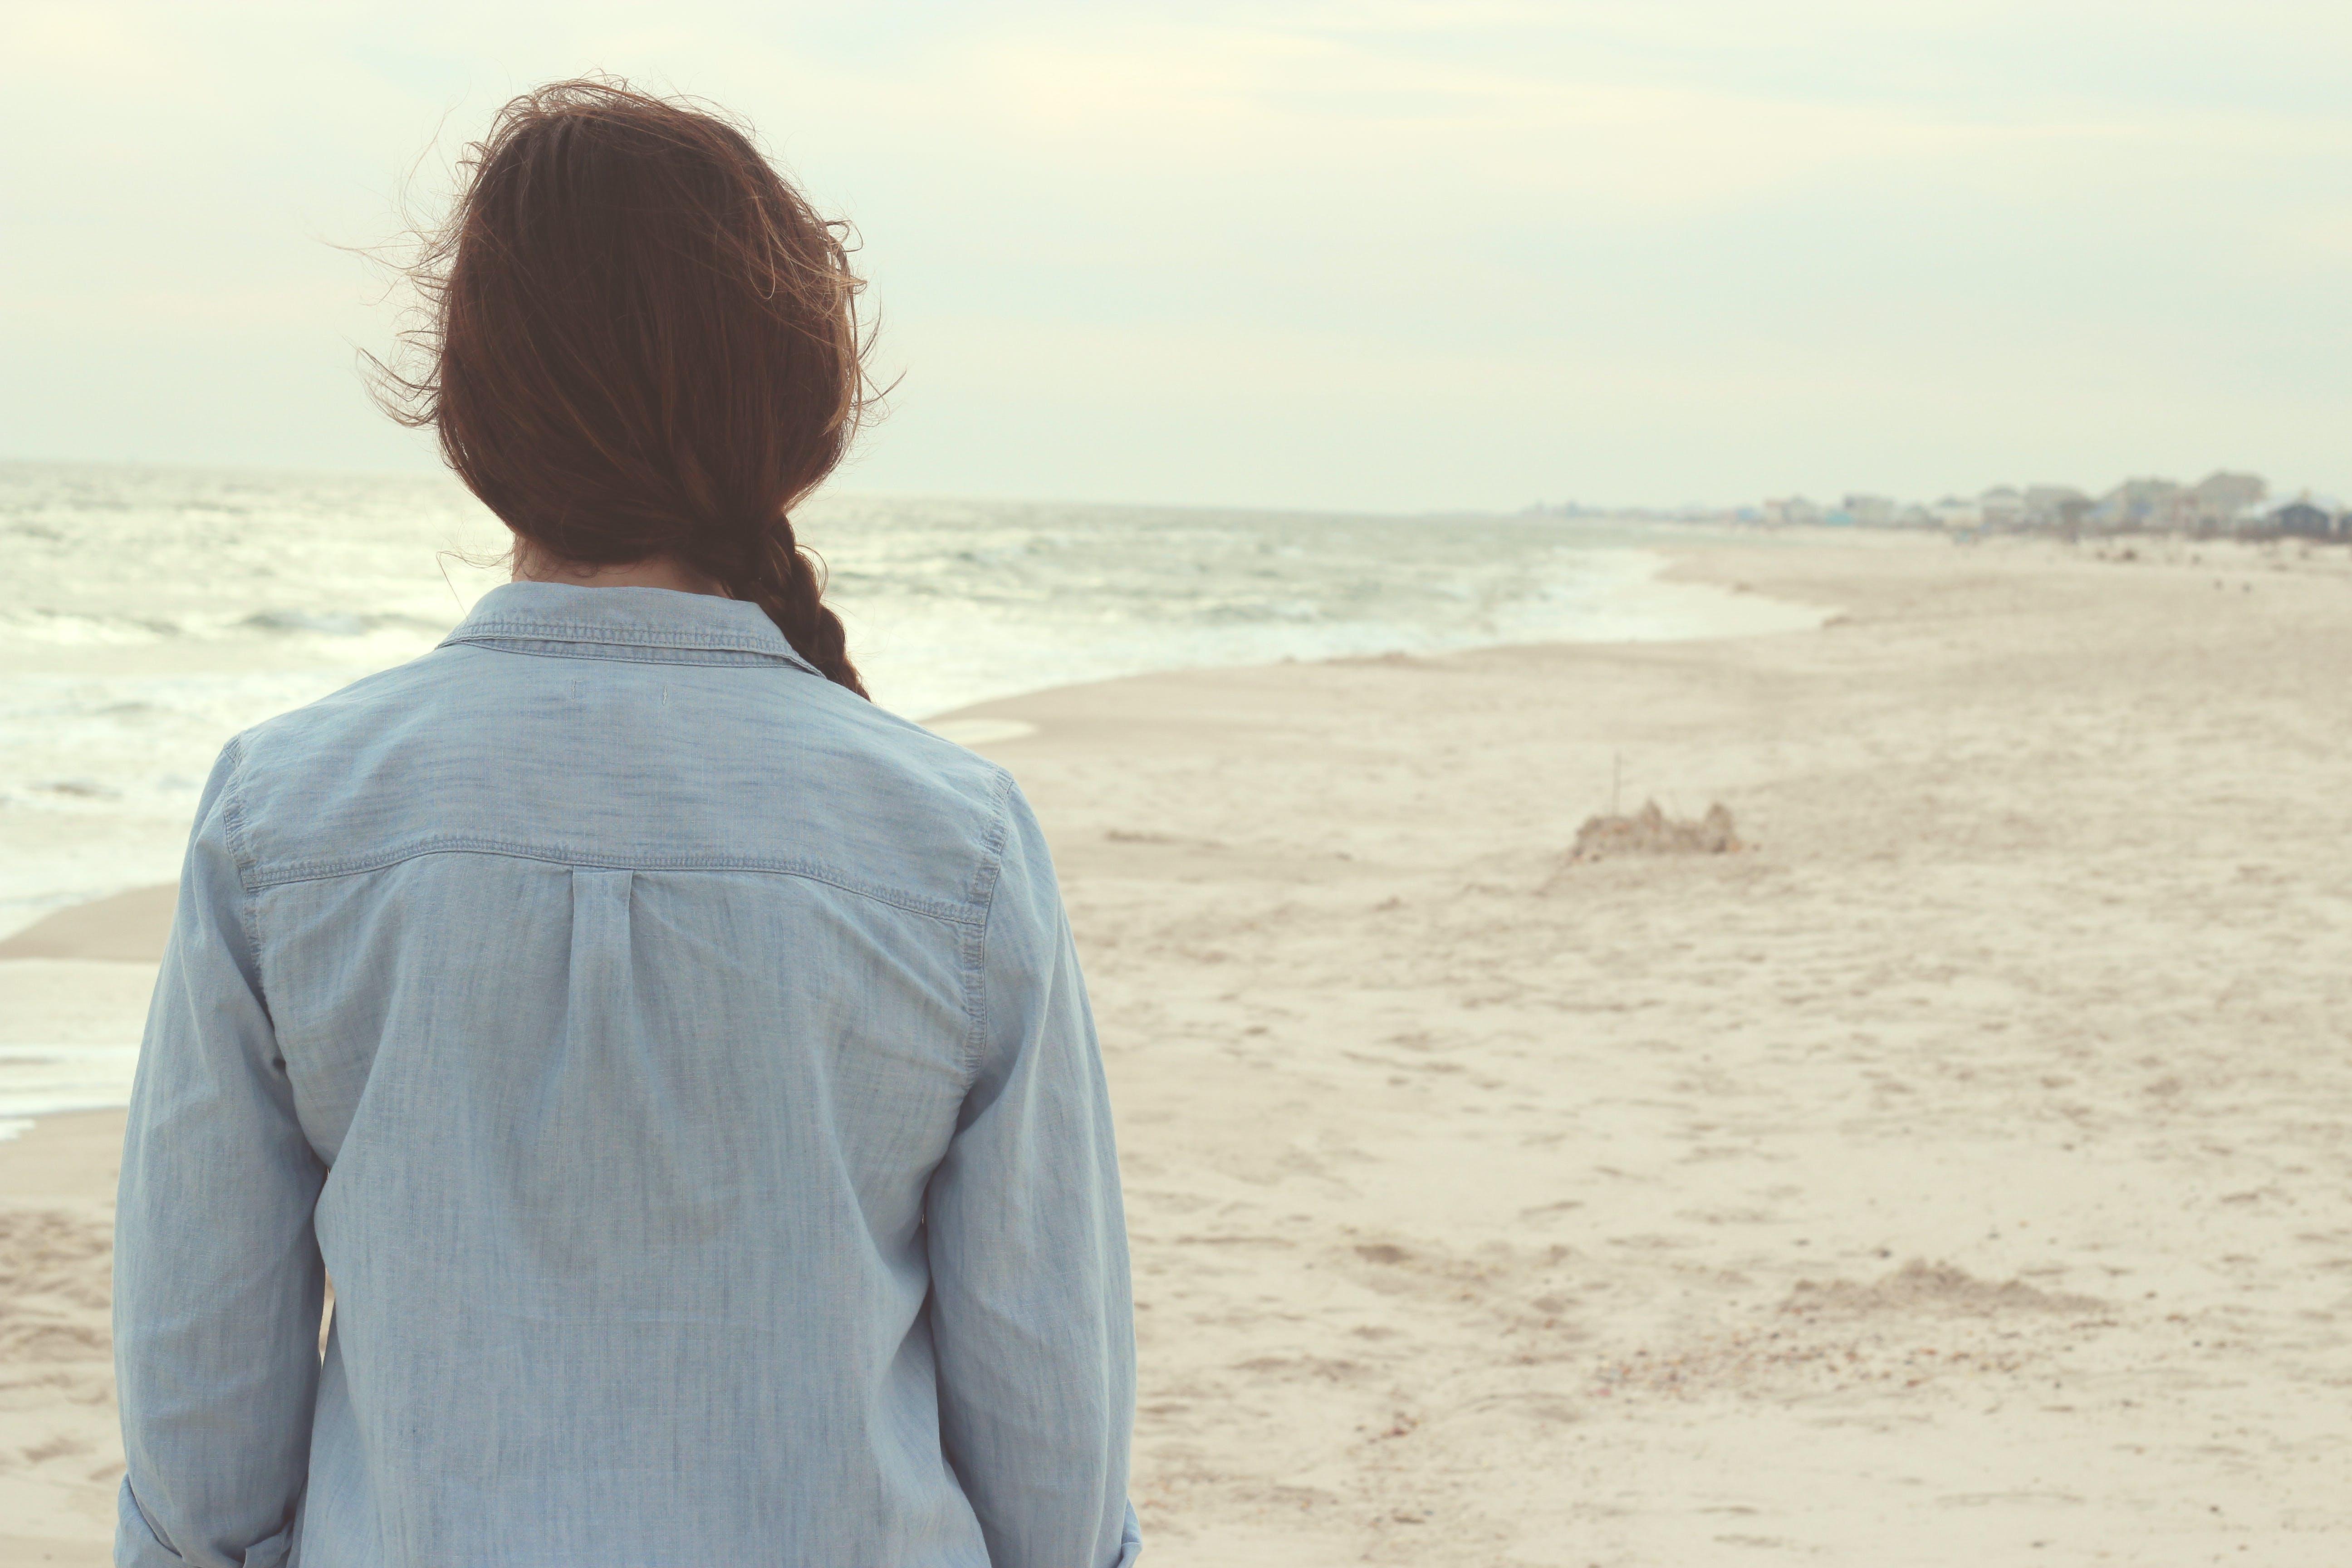 alone, back, beach